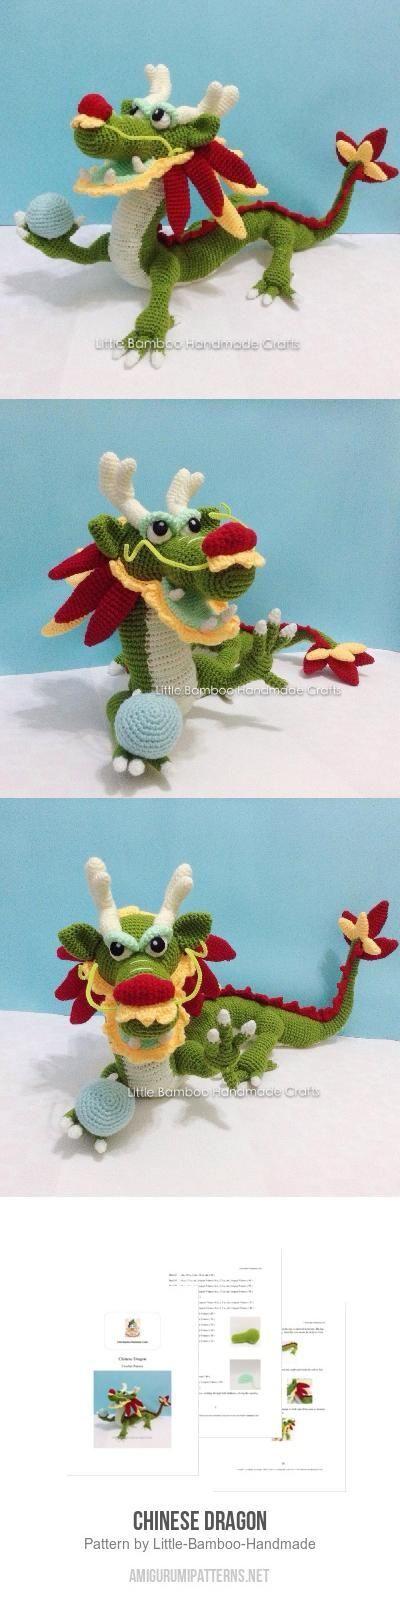 Chinese dragon amigurumi pattern by Little Bamboo Handmade ...